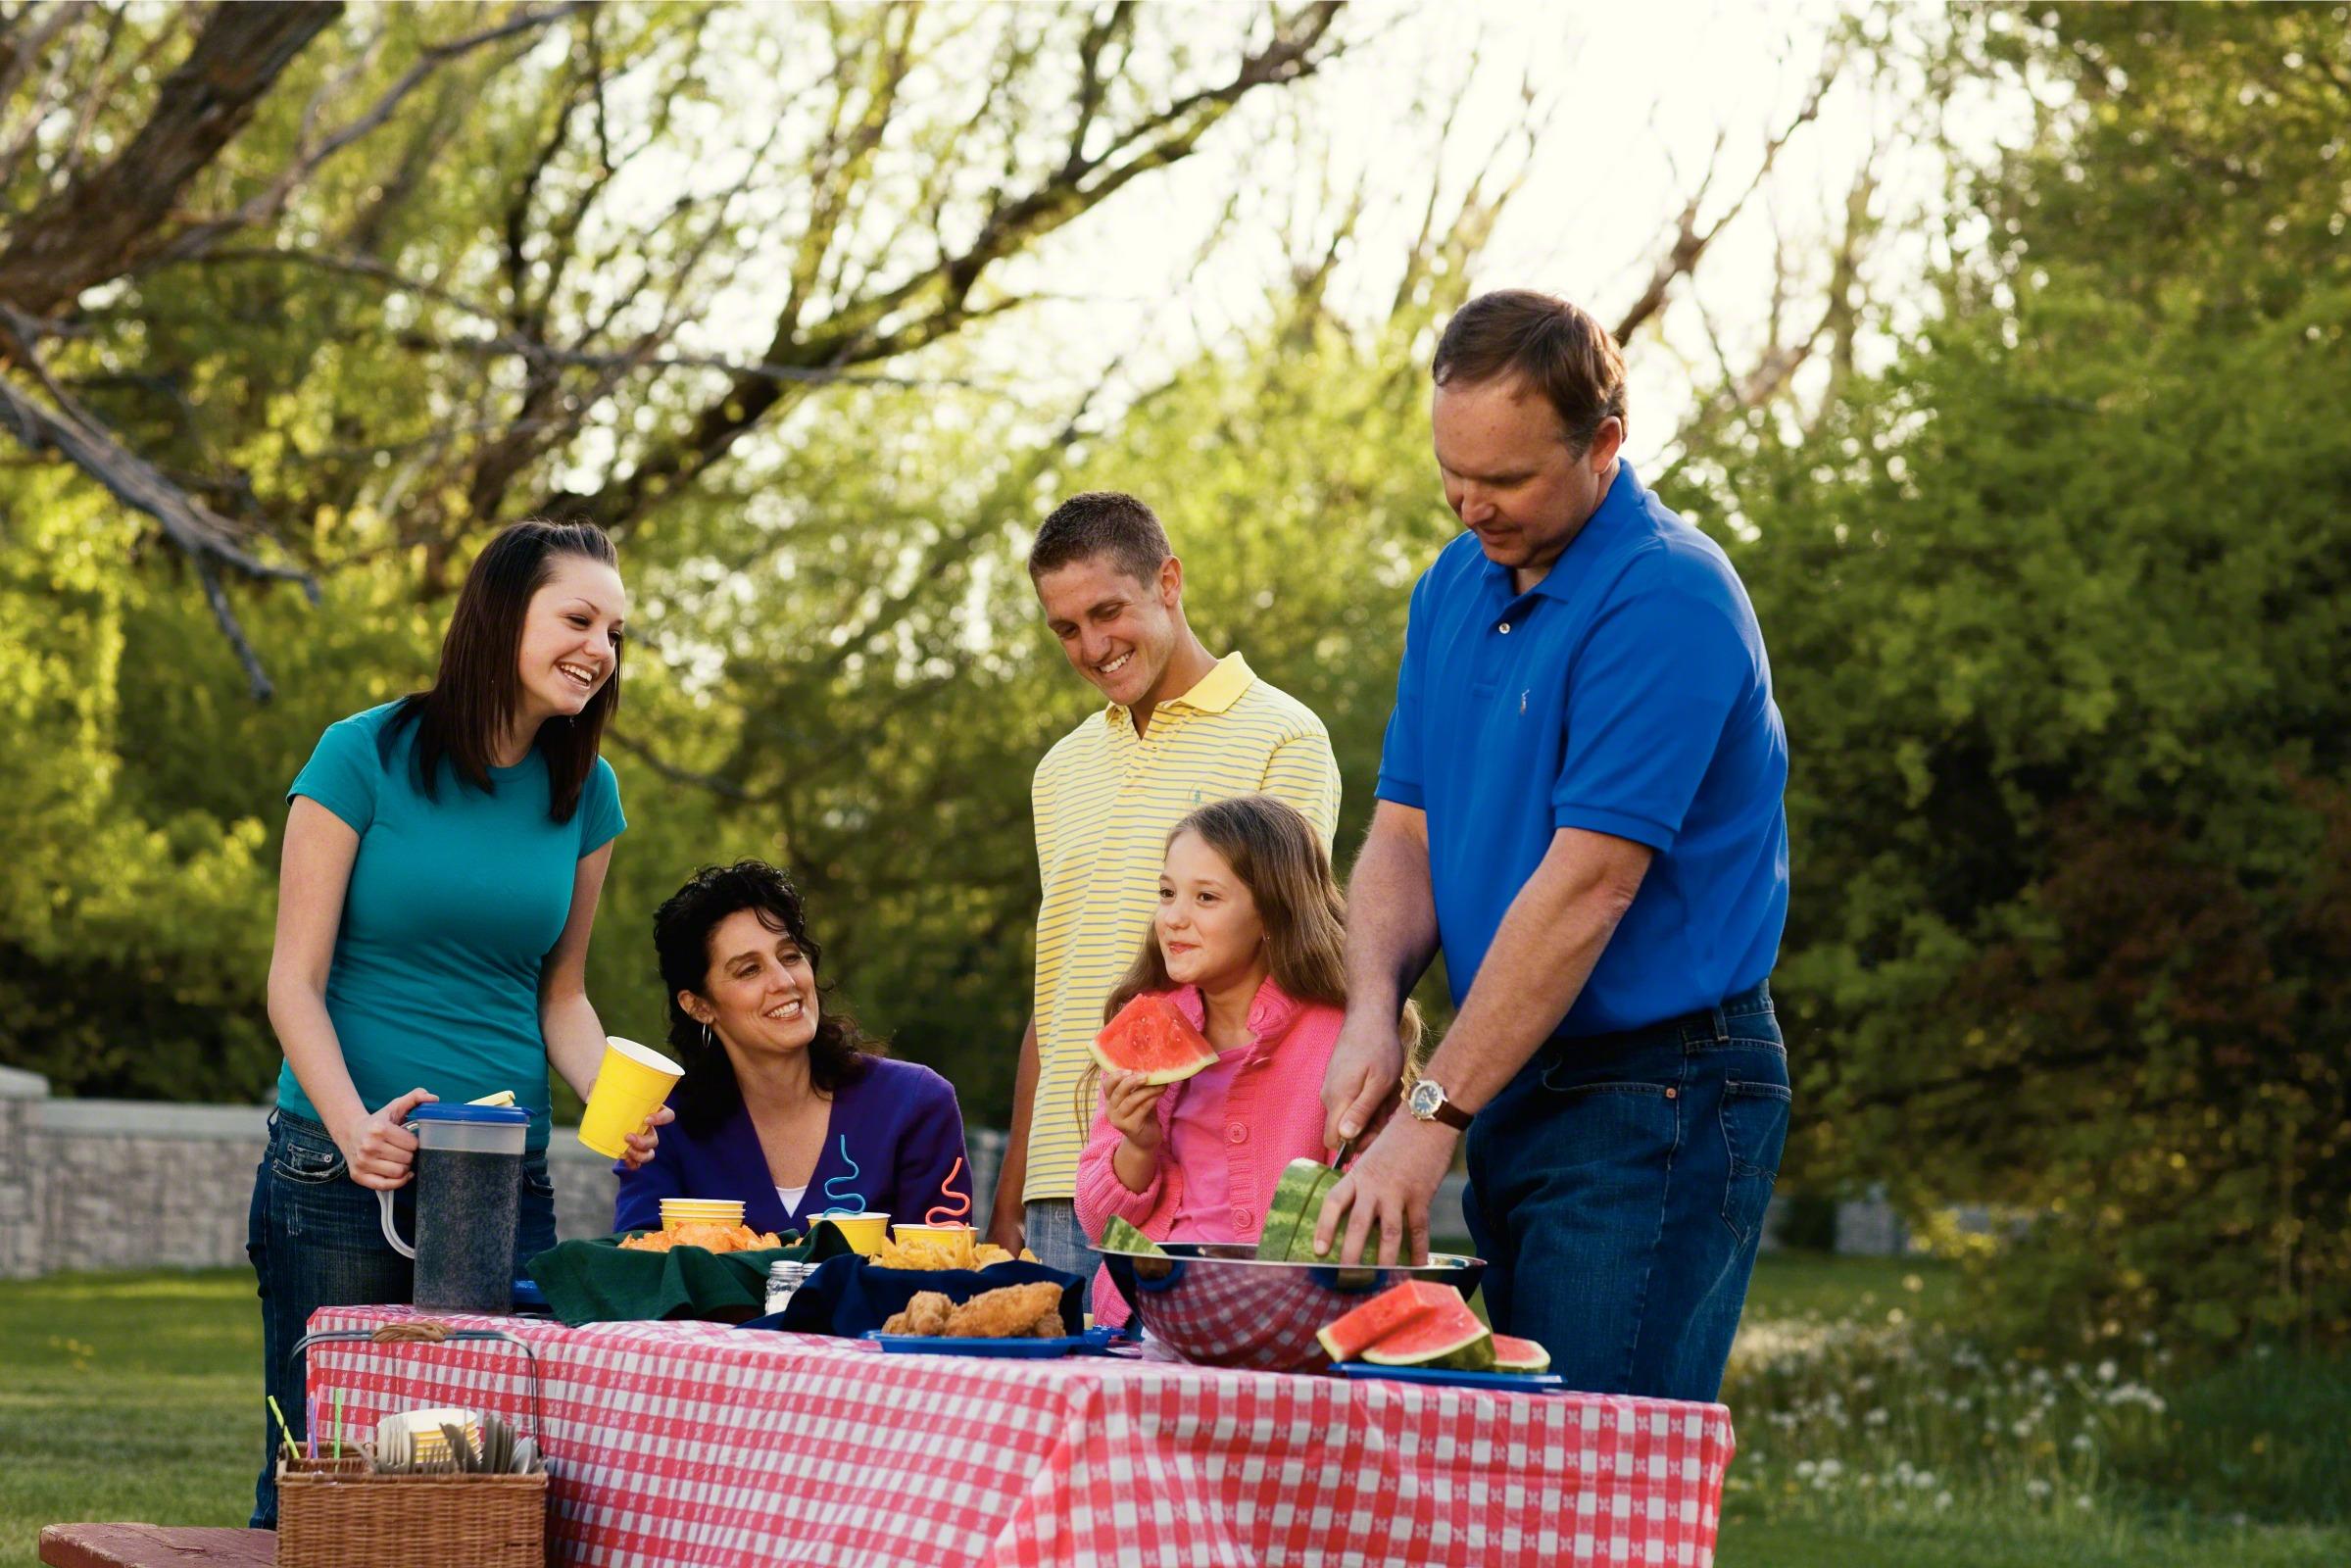 Family picnic photo